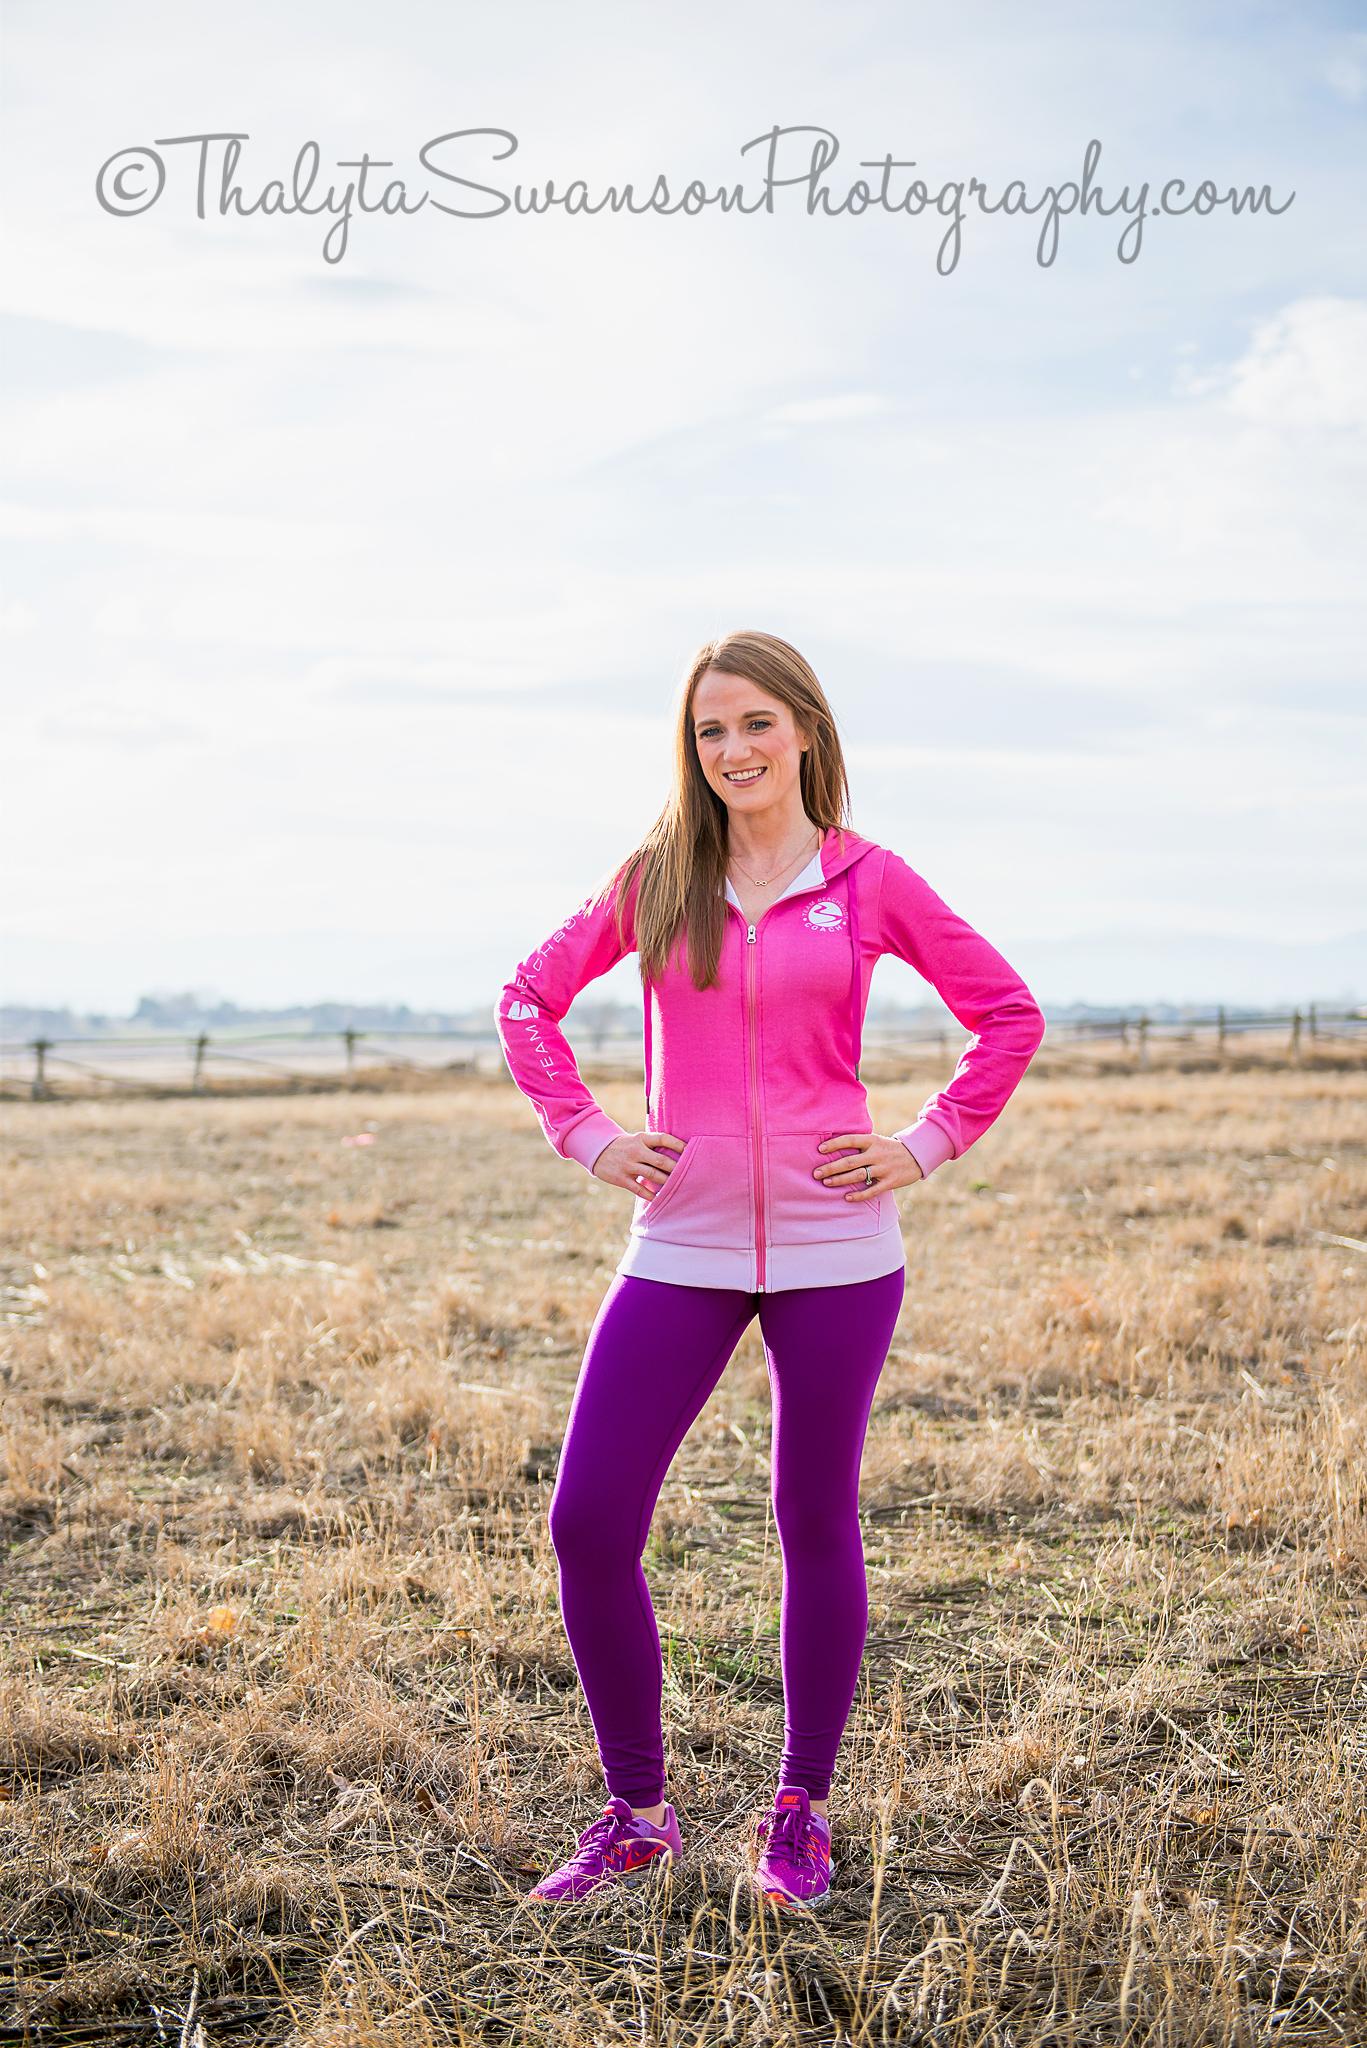 Thalyta Swanson Photography - Fitness Photos (1)